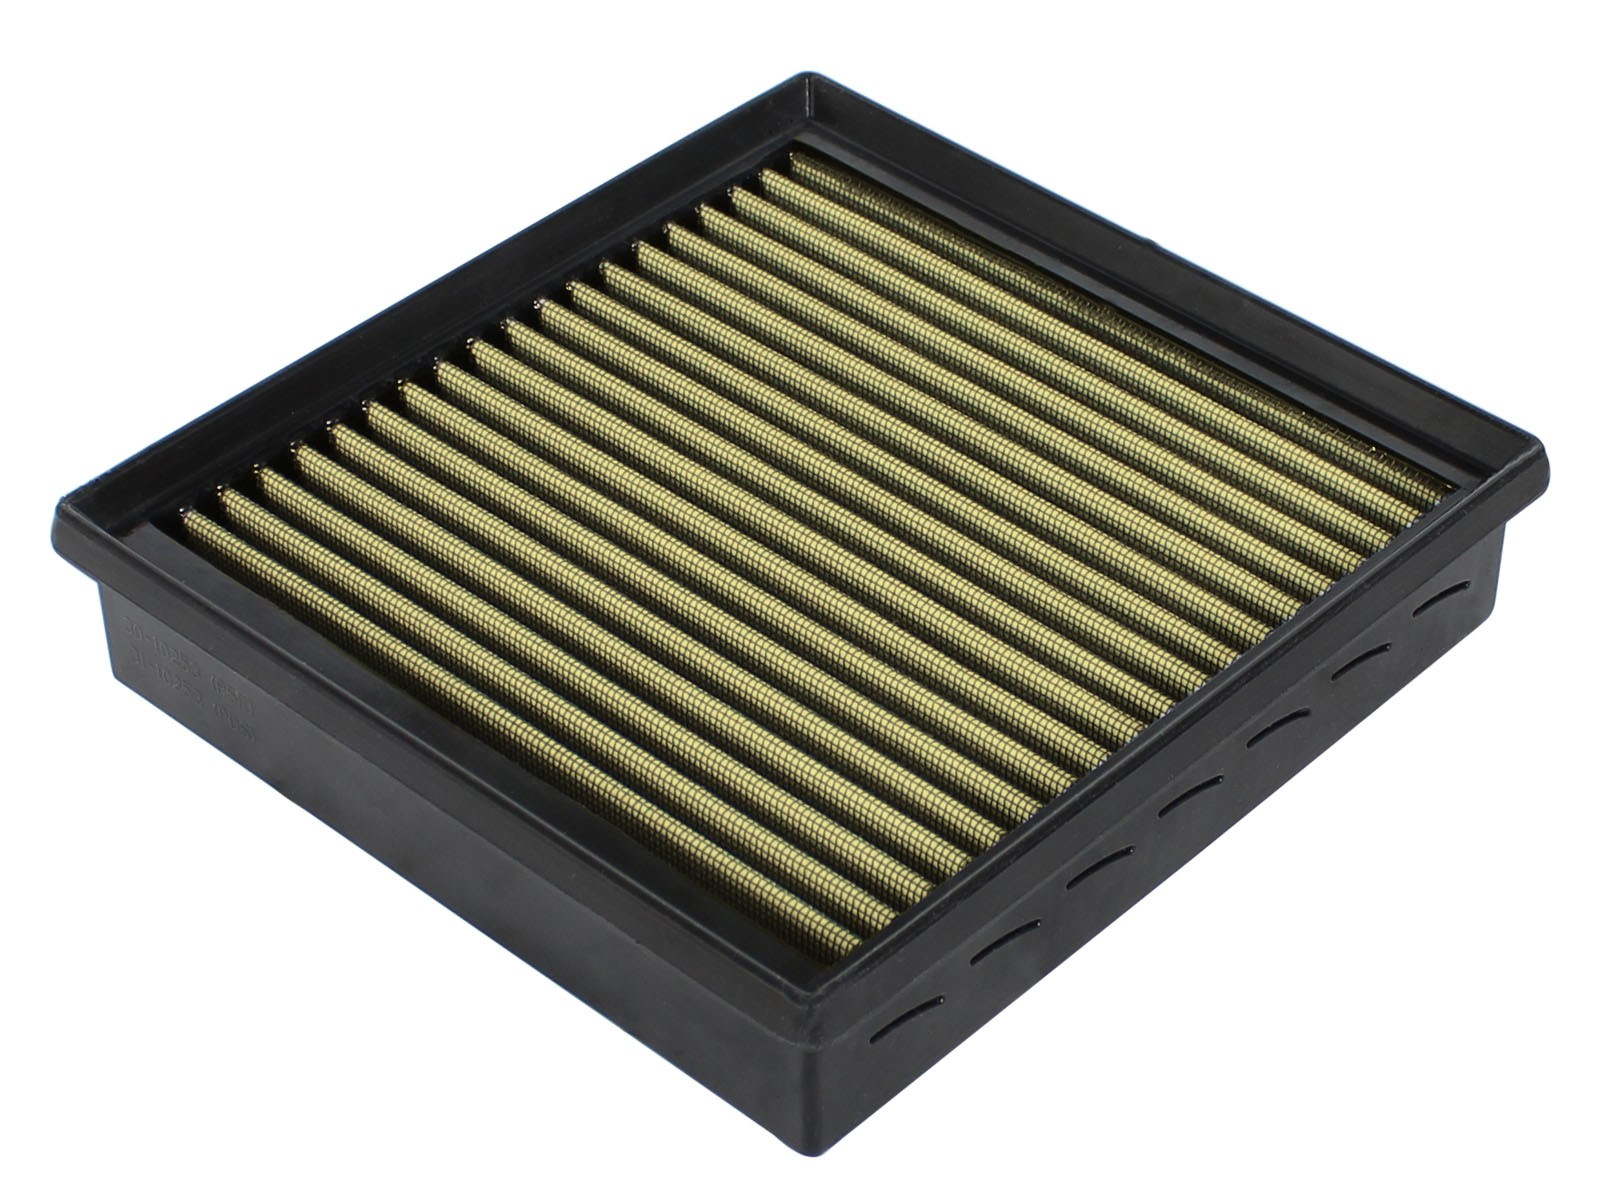 aFe POWER 73-10253 Magnum FLOW Pro GUARD7 Air Filter